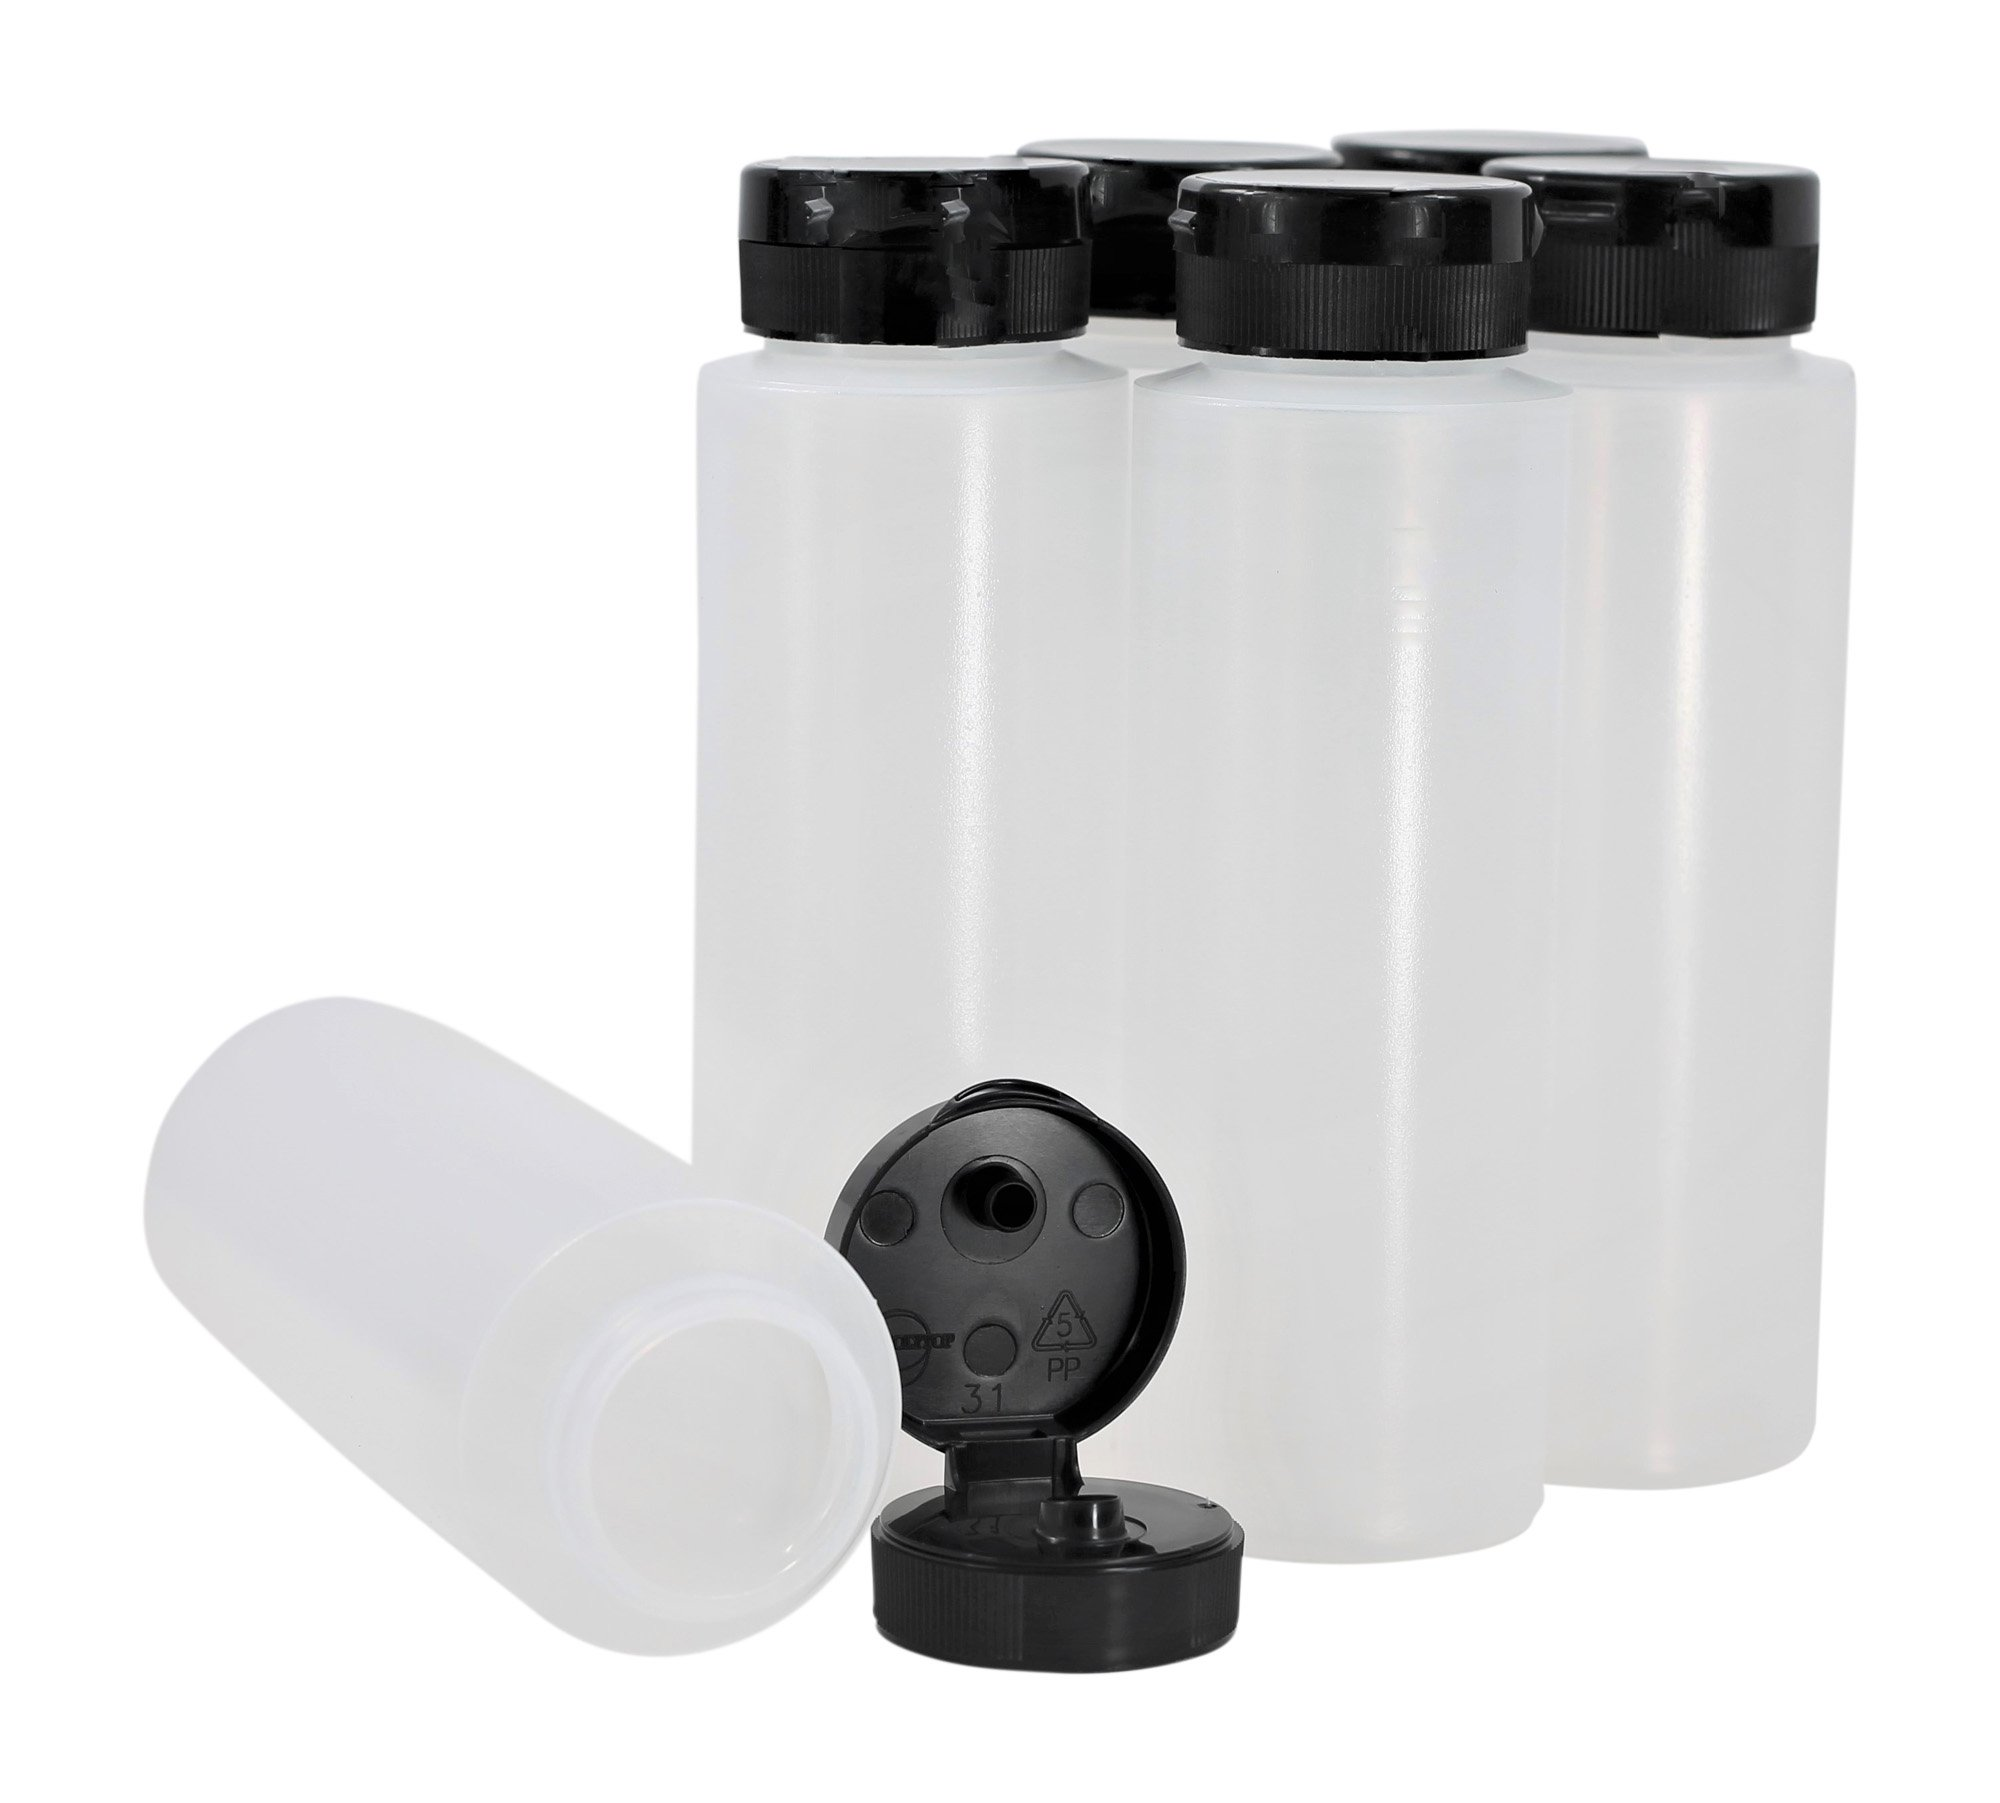 Pinnacle Mercantile Easy Squeeze Plastic Condiment Bottles with Flip Top Cap 8 oz Empty Set 6 by Pinnacle Mercantile